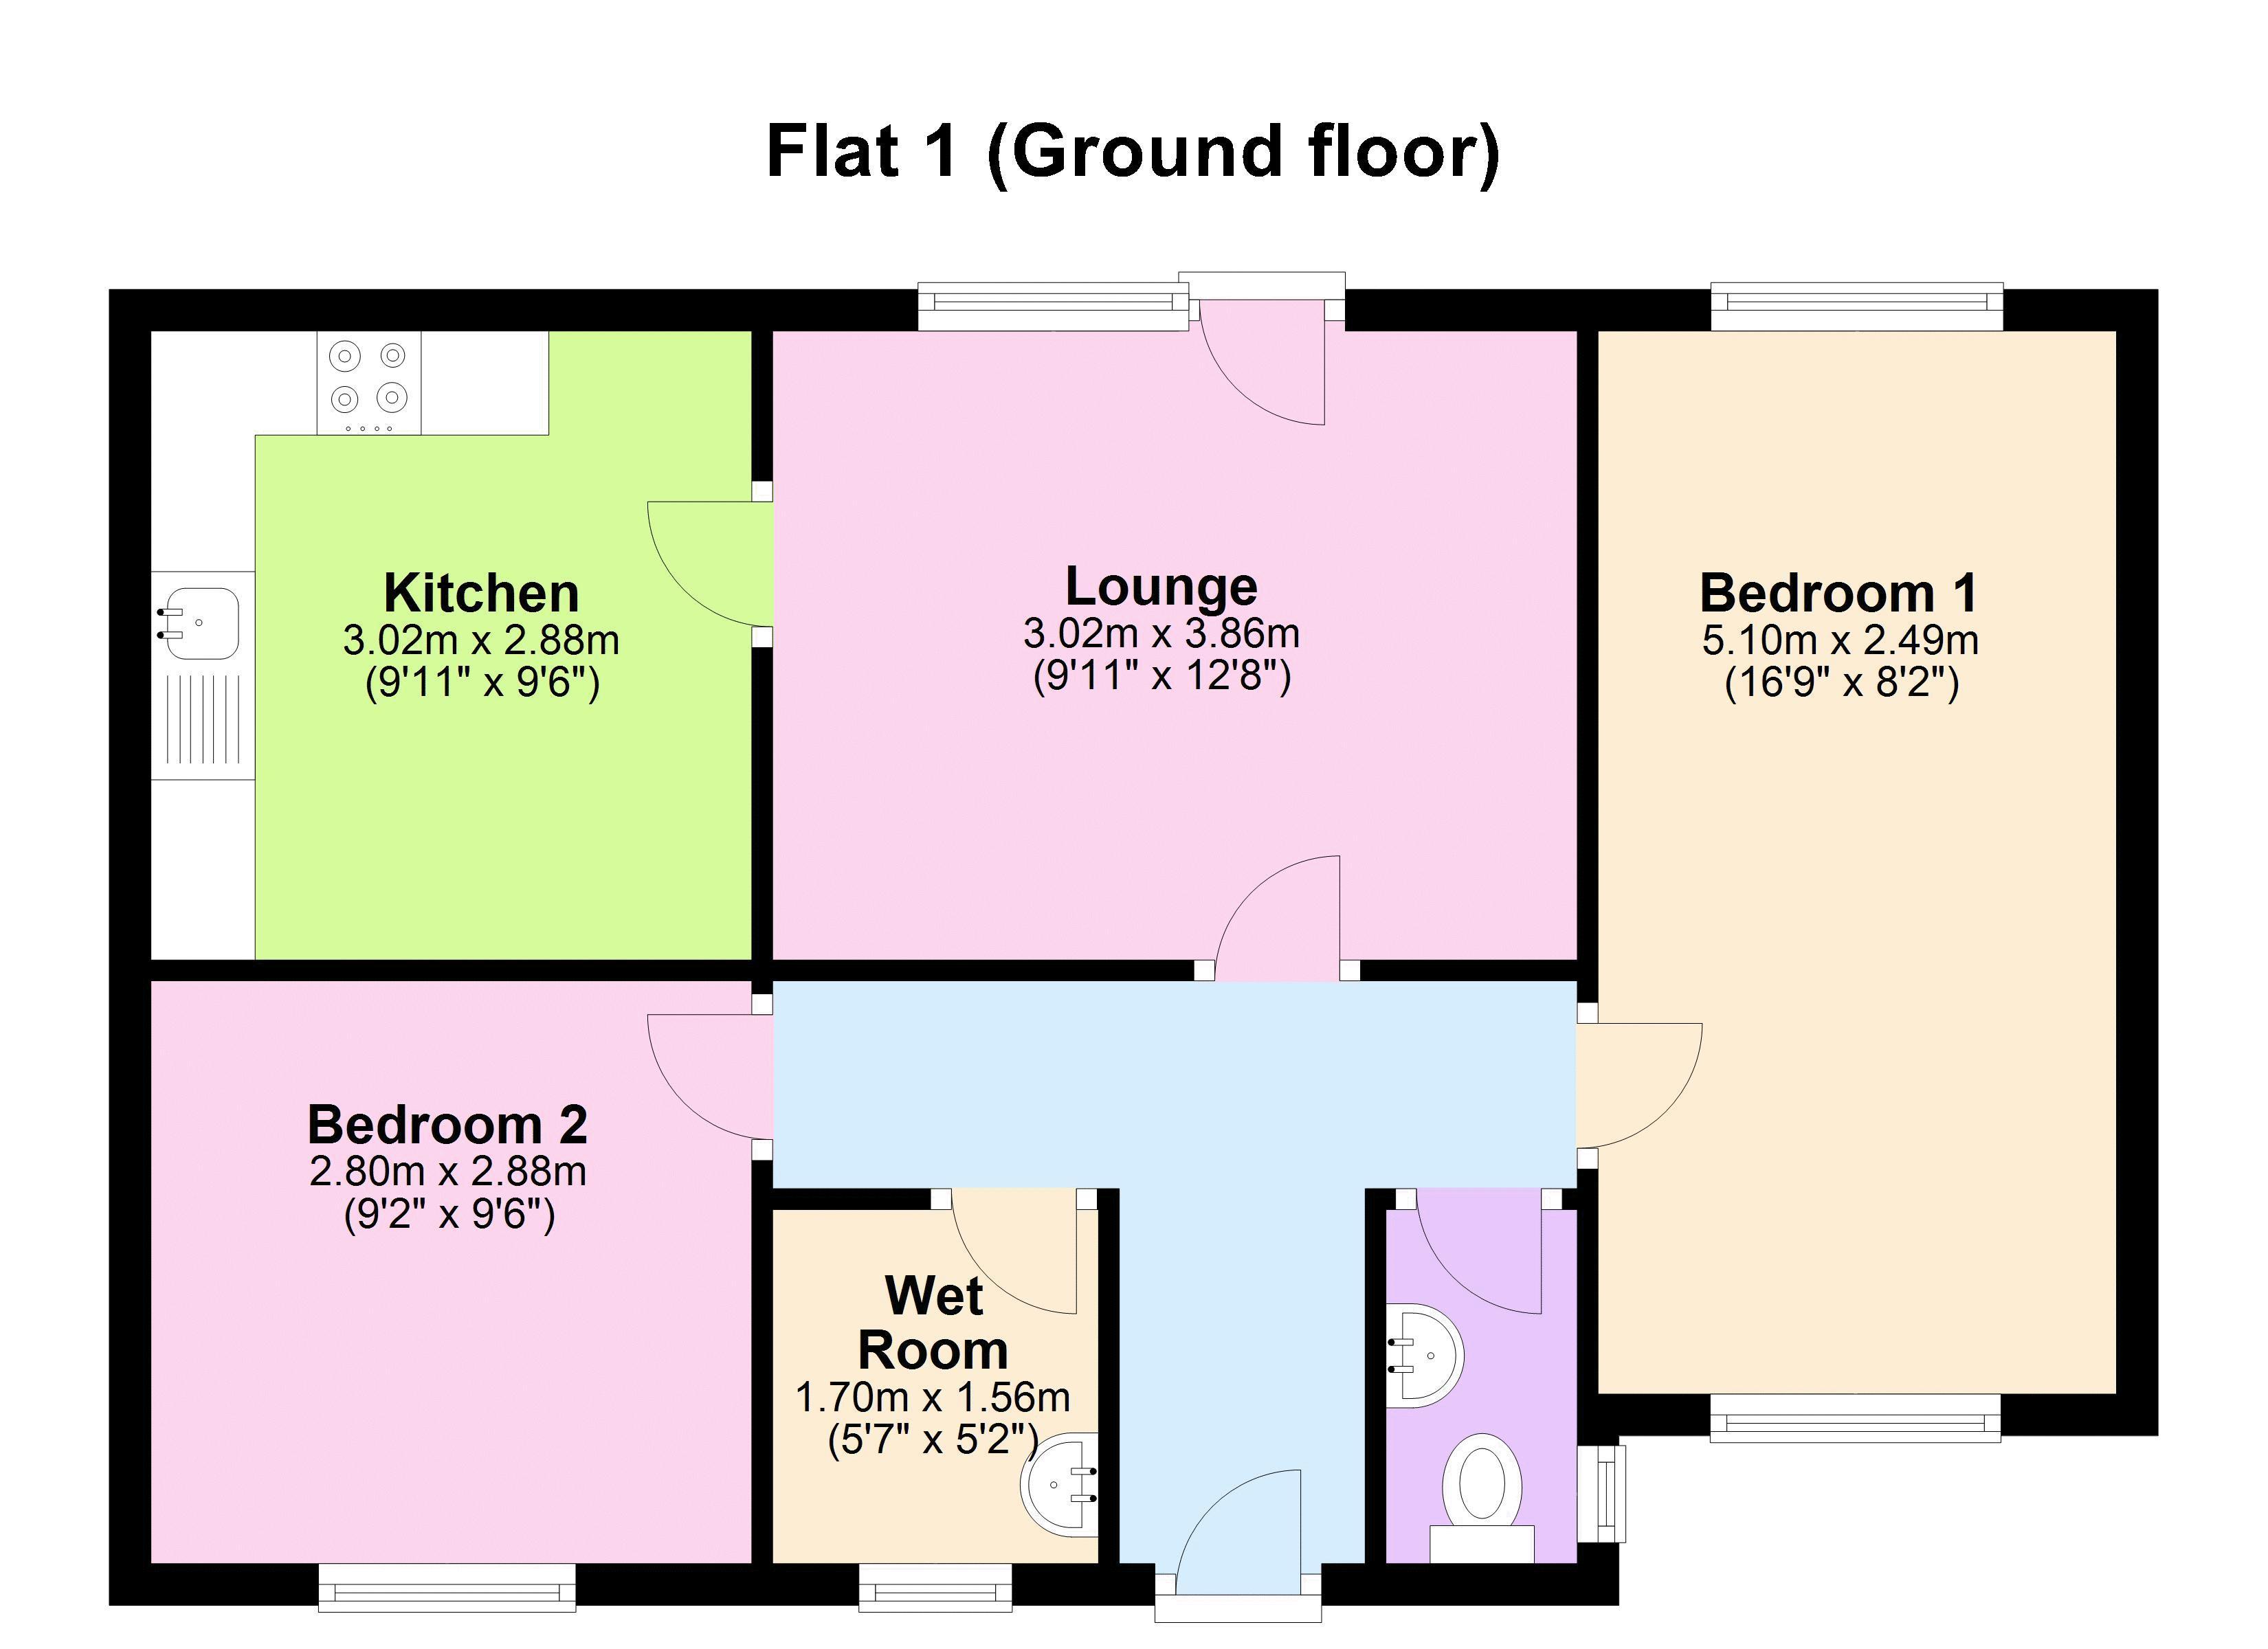 Flat 1